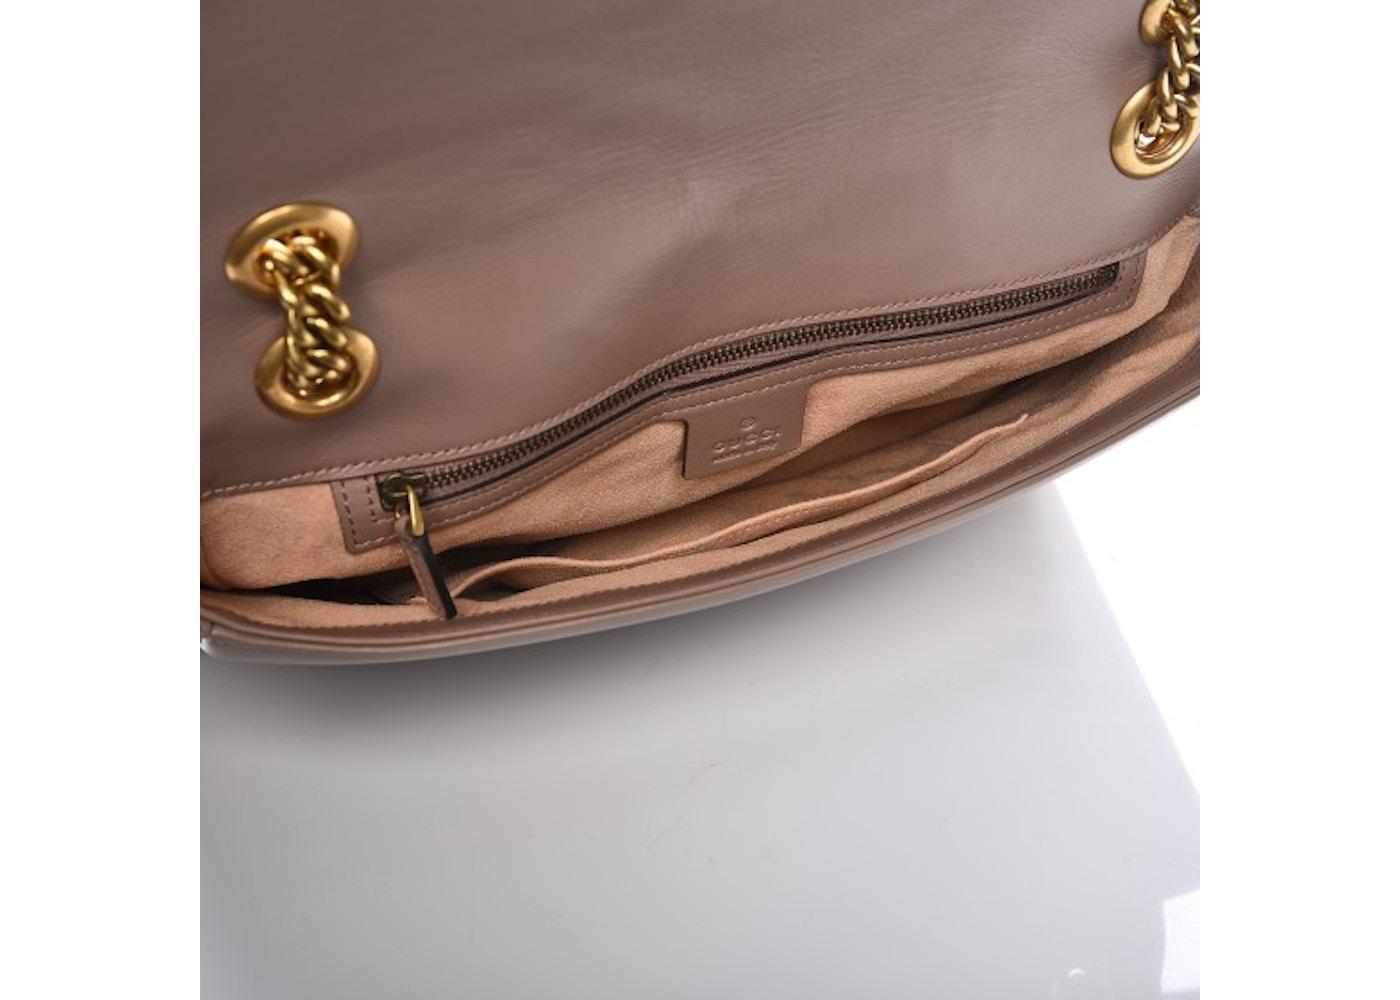 815d8915a4d Gucci Marmont Shoulder Bag Matelasse GG Medium Porcelain Rose